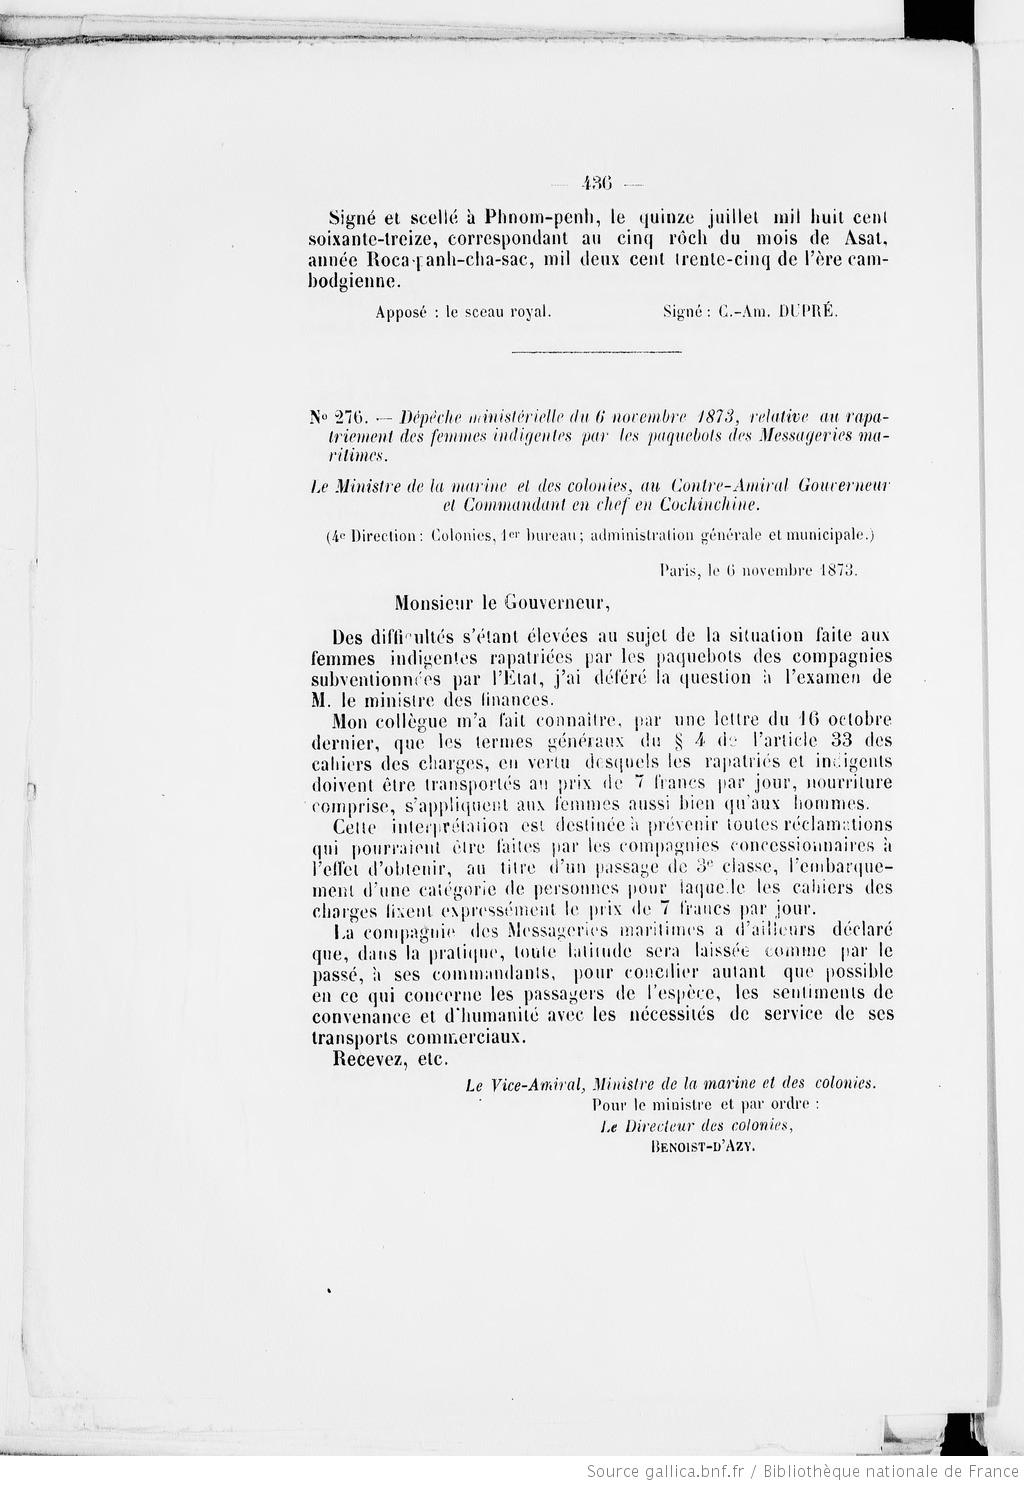 http://gallica.bnf.fr/ark:/12148/bpt6k1261881t/f4.highres